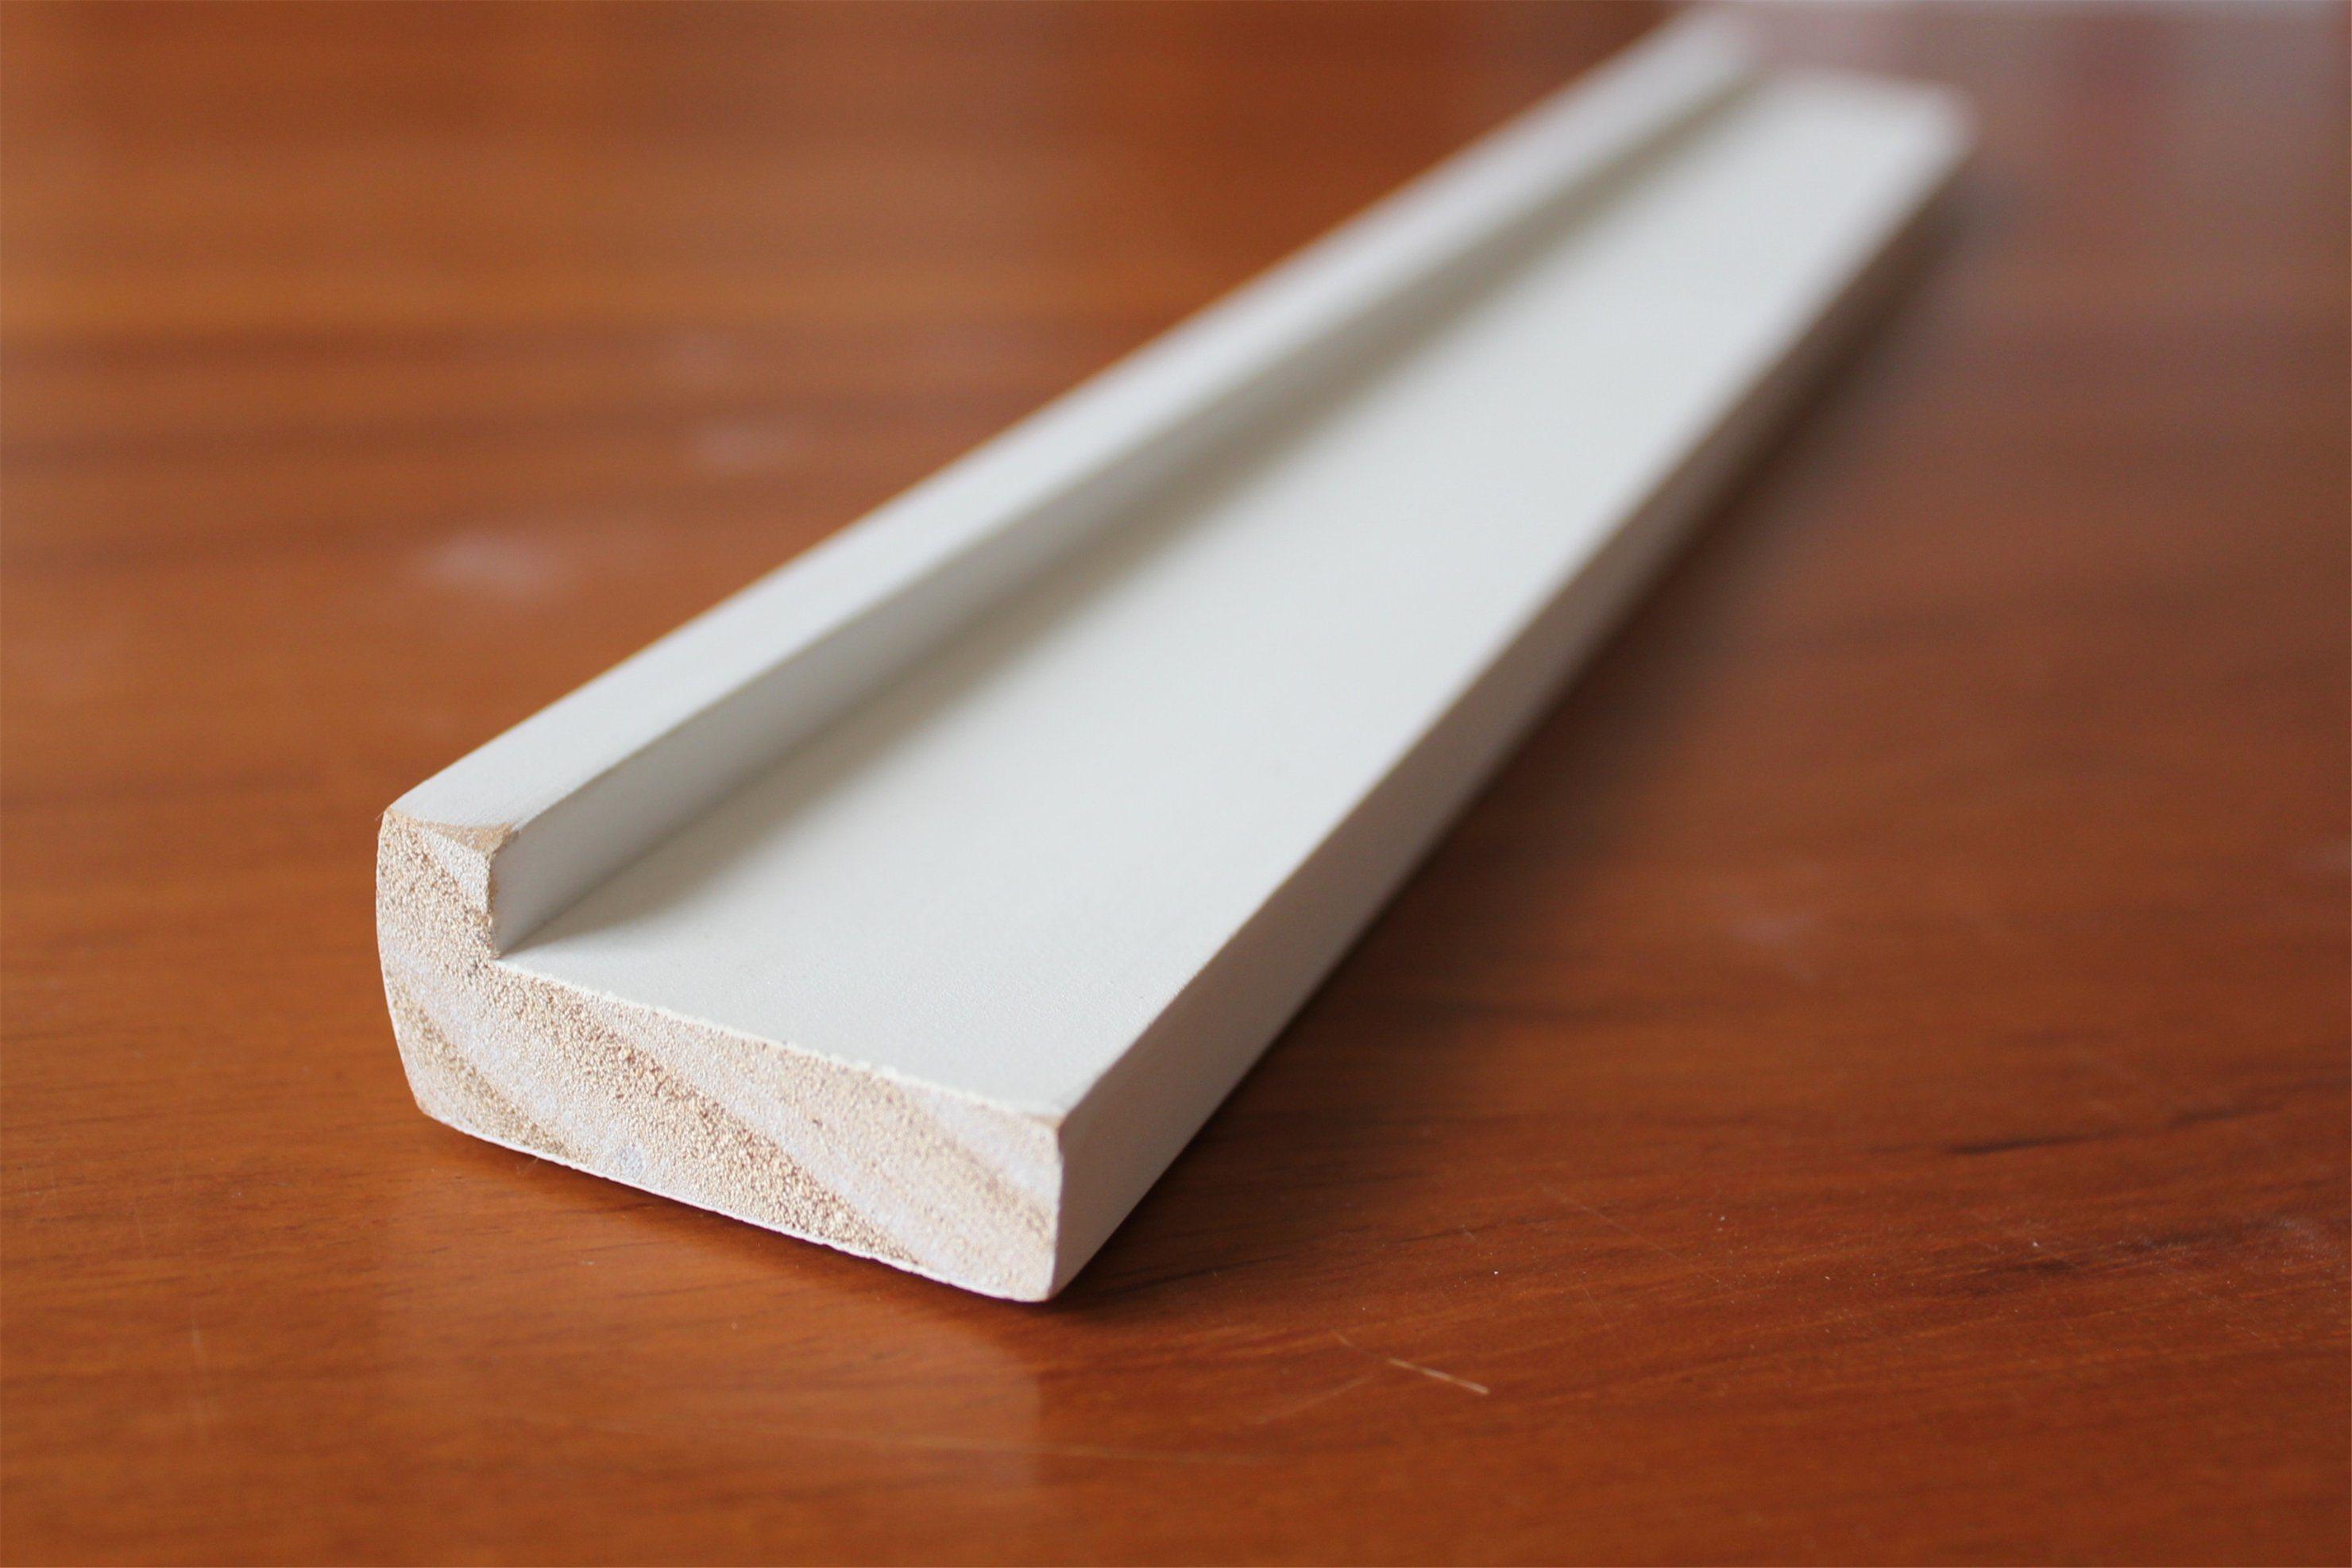 Modern House Design Primed Wood Interior Baseboard Mouldings Skirting Board